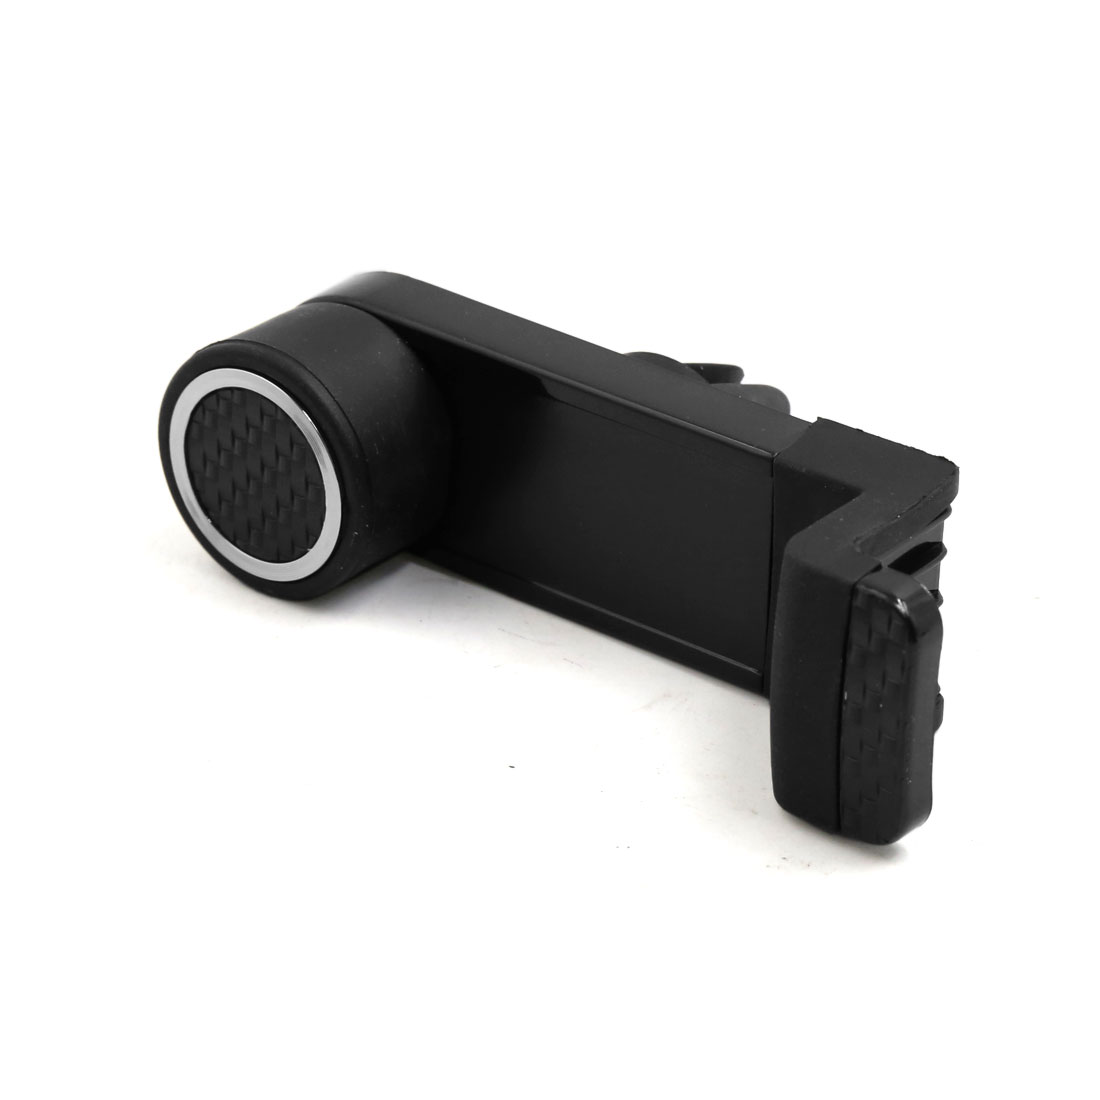 360 Degree Rotation Adjustable Portable Car Air Vent Mobile Phone Holder